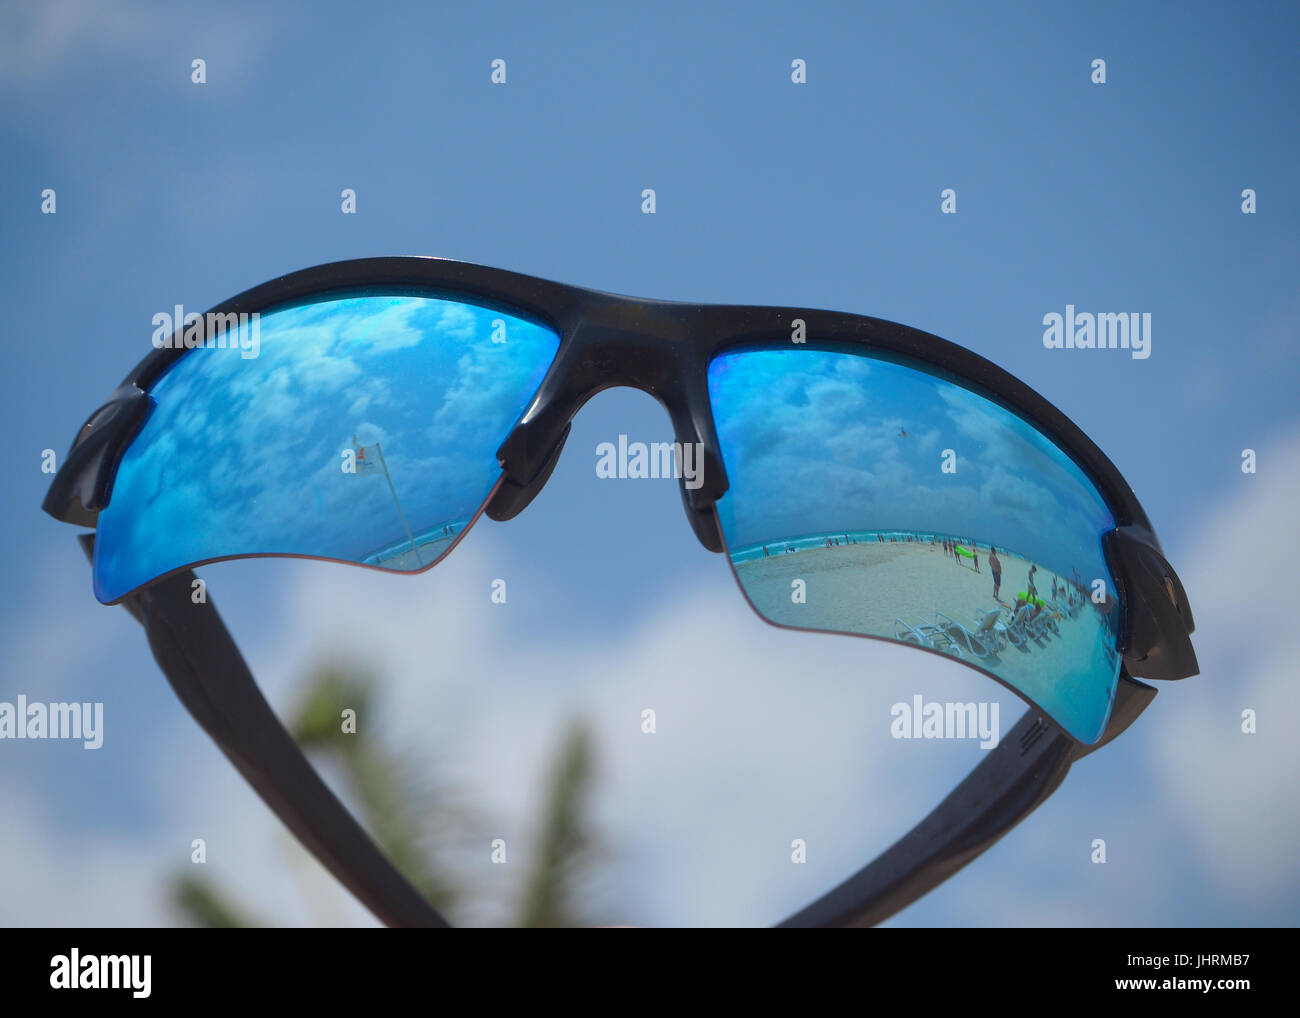 Blue sunglasses - Stock Image